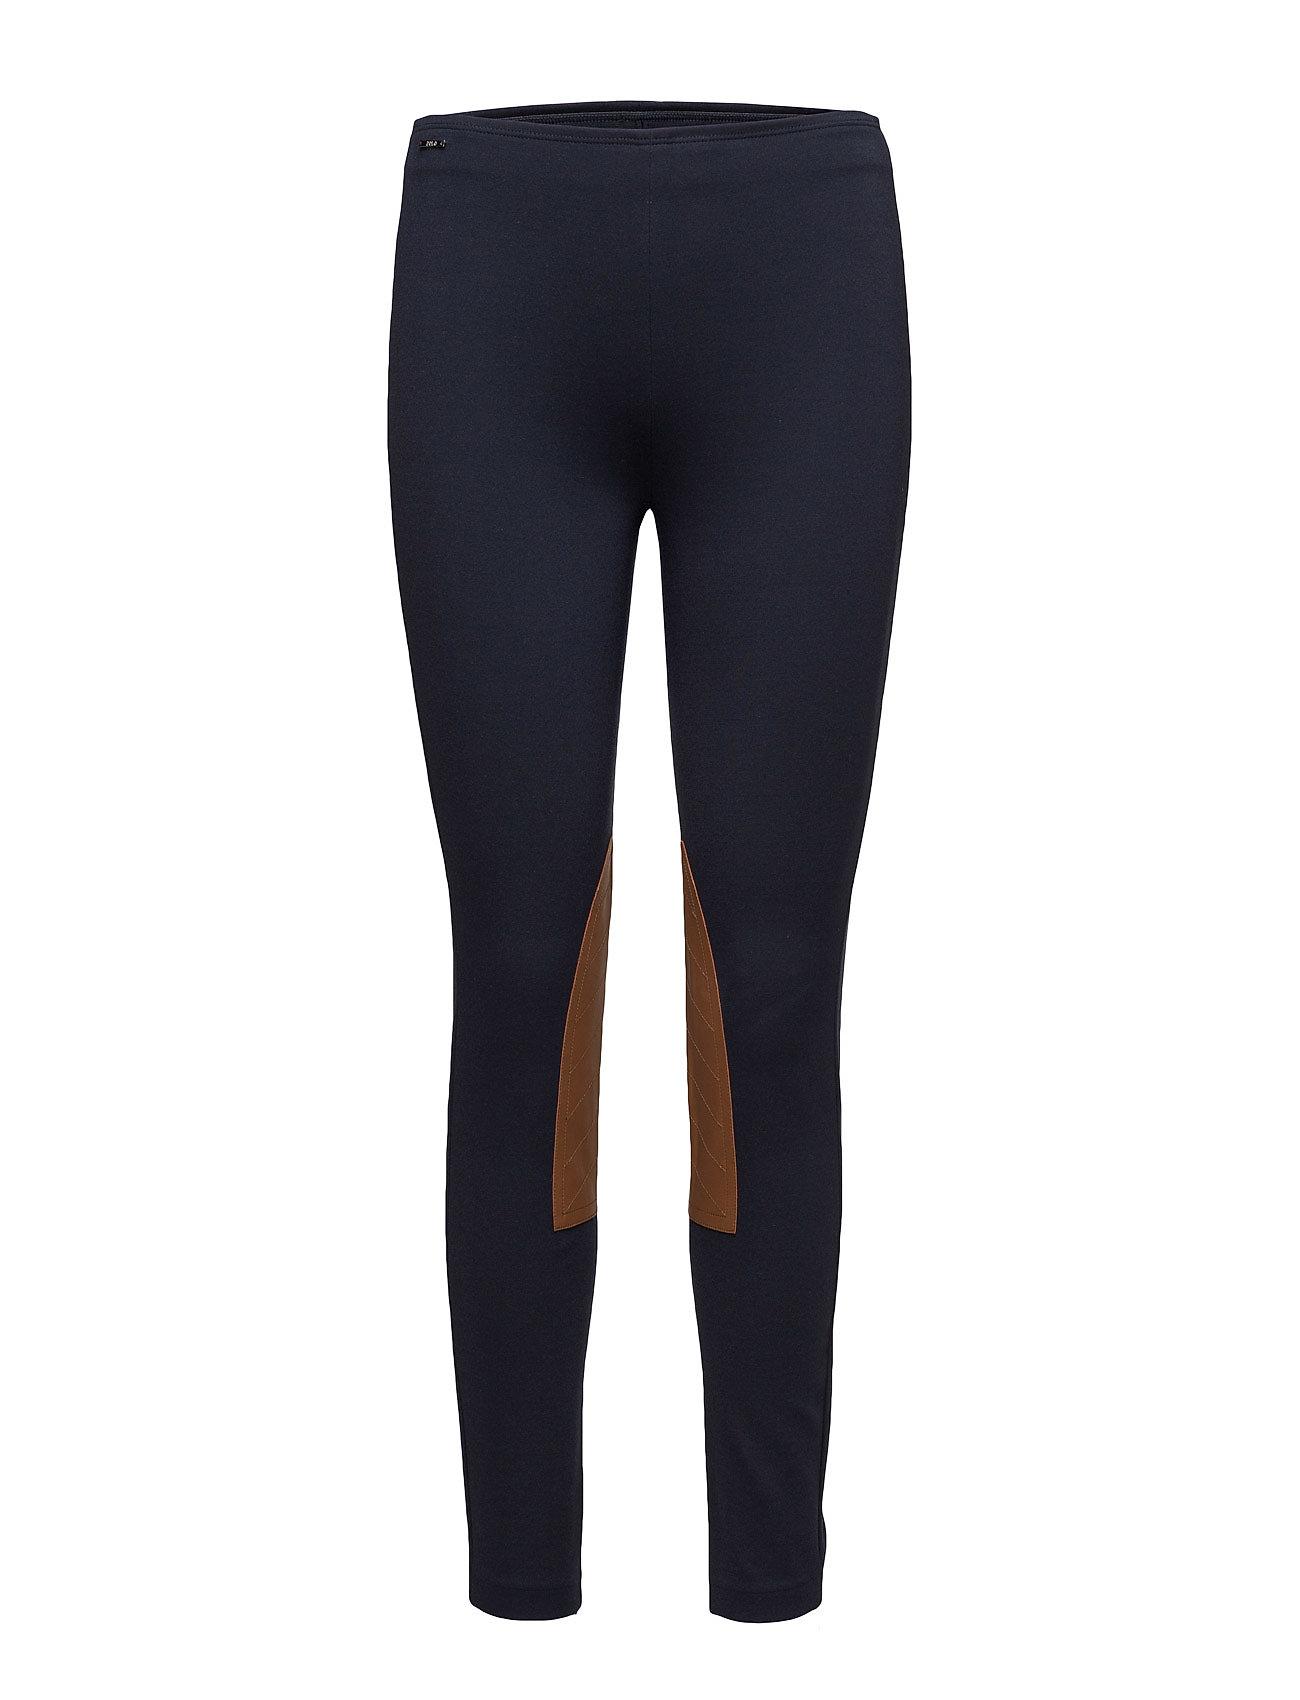 Polo Ralph Lauren Jodhpur Skinny Pant